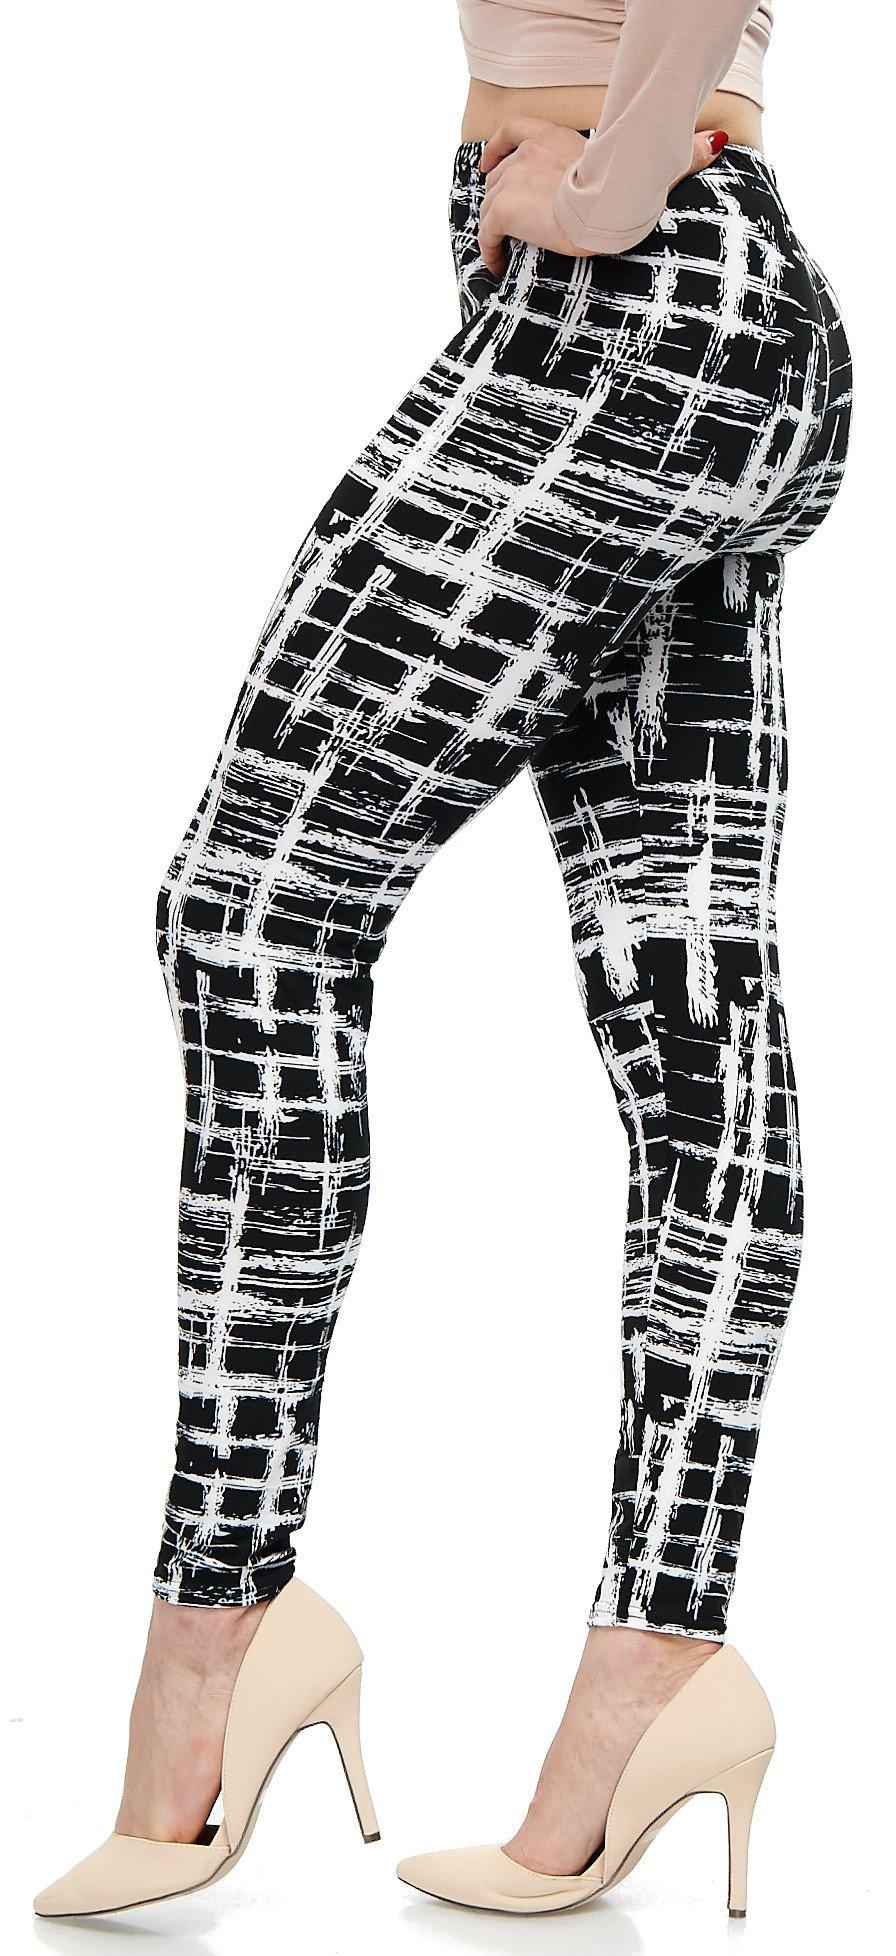 LMB Lush Moda Extra Soft Leggings with Designs- Variety of Prints - 720F Black White Stripes B5 by LMB (Image #1)